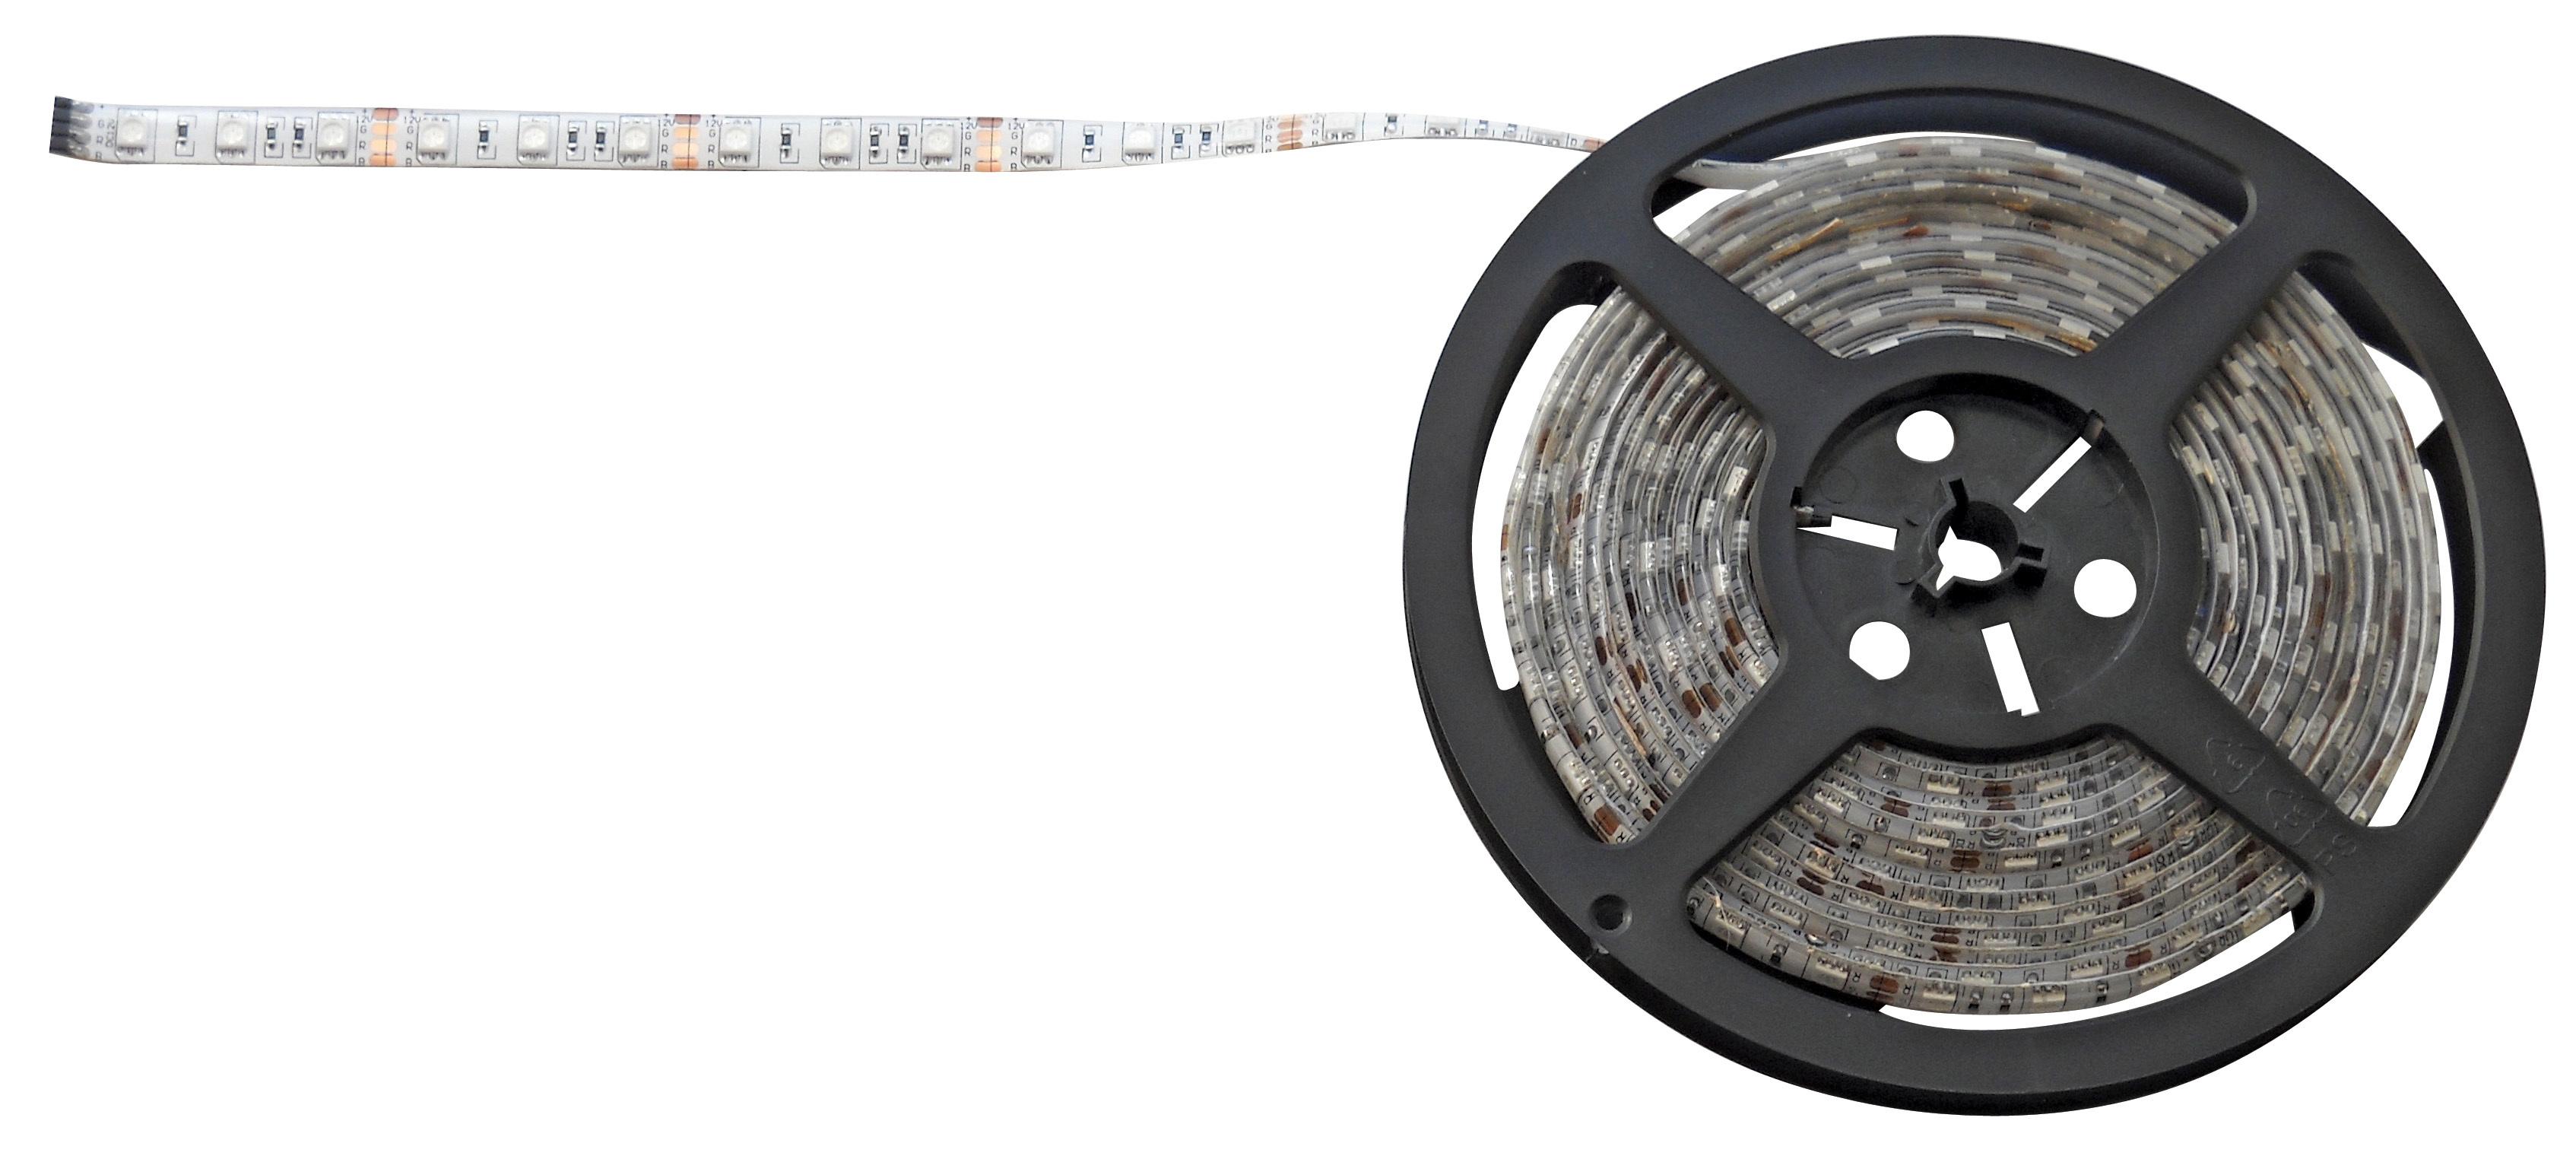 Add On Strip for LED Strip Light Kit - 33 Foot 52697